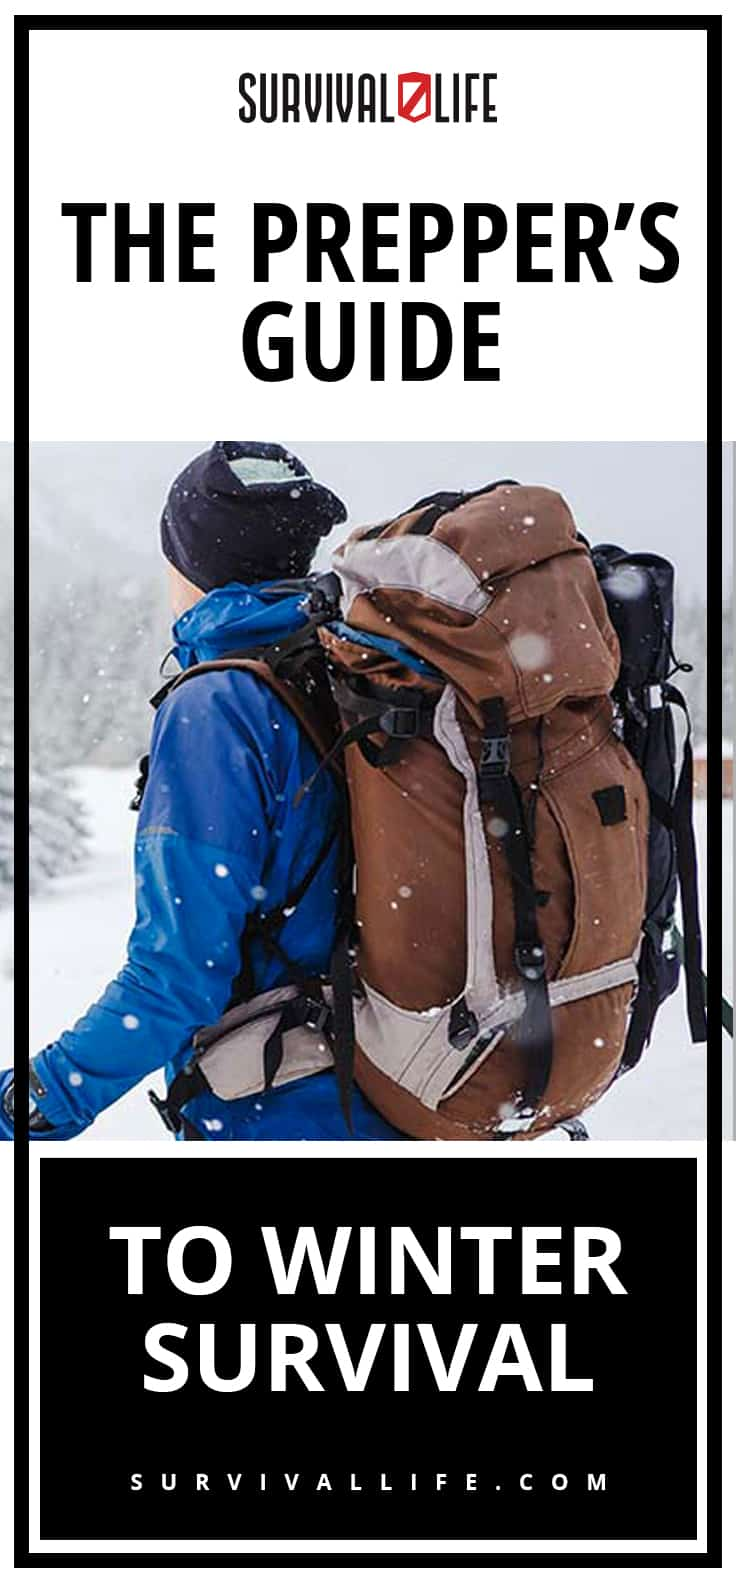 Winter Survival Kit: The Prepper's Guide To Winter Survival   https://survivallife.com/winter-survival-kit/